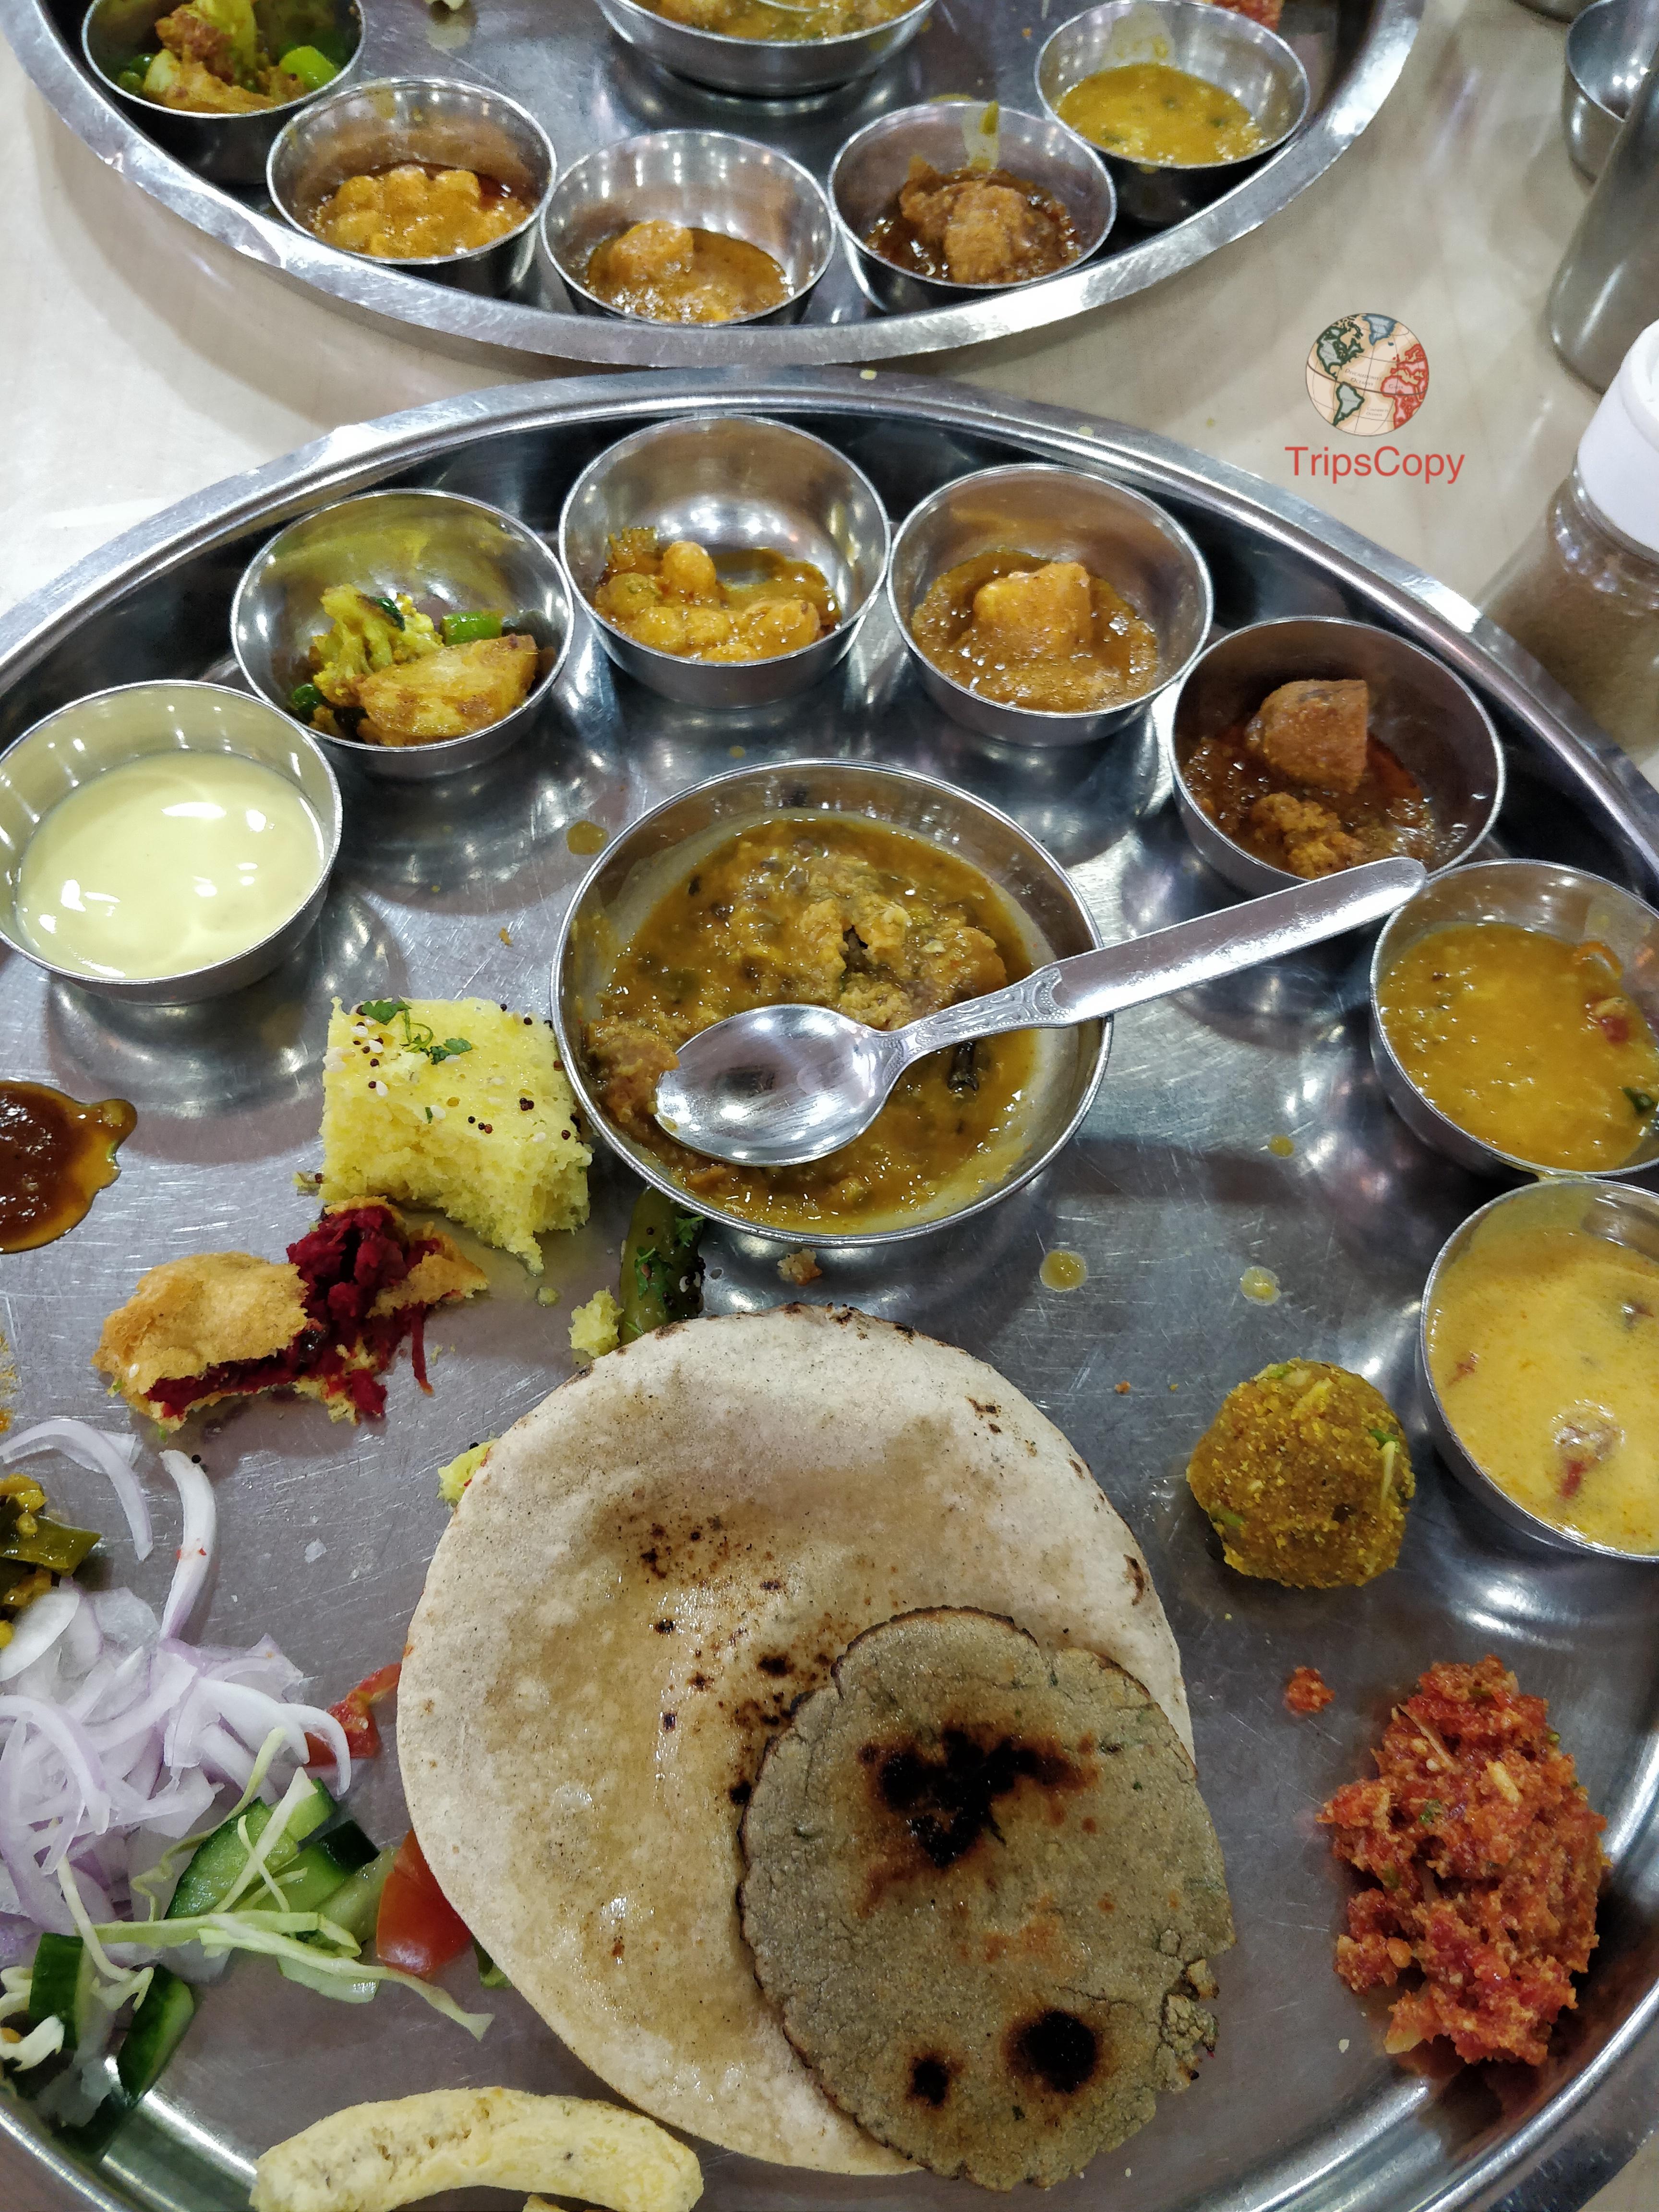 Jodhpuri Thali (full meal with 31 dishes)